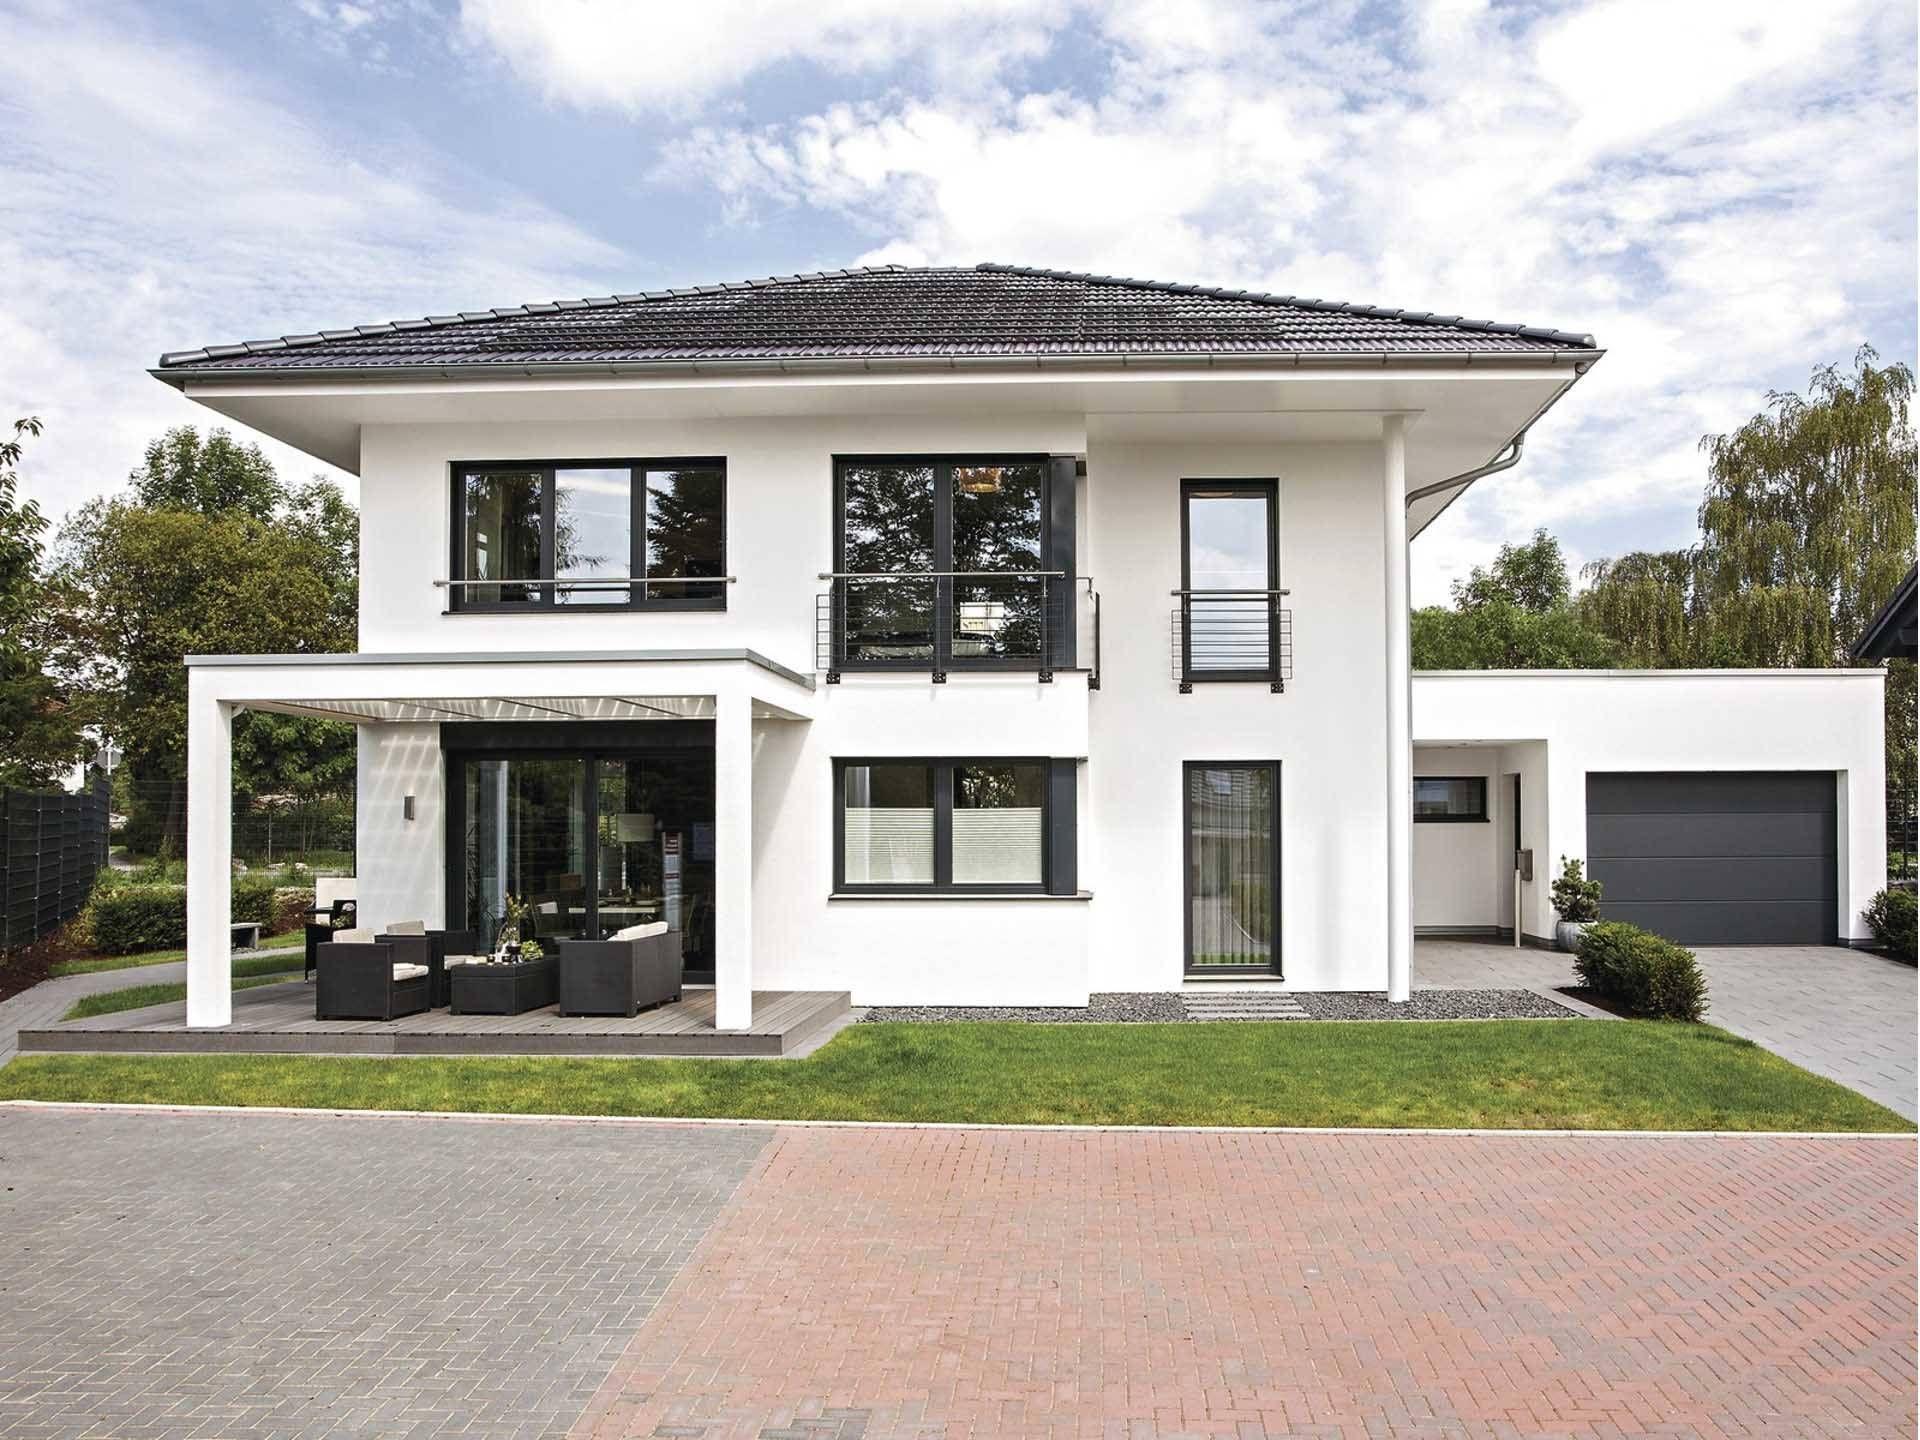 Musterhaus CityLife 250 WeberHaus Haus, Weber haus und